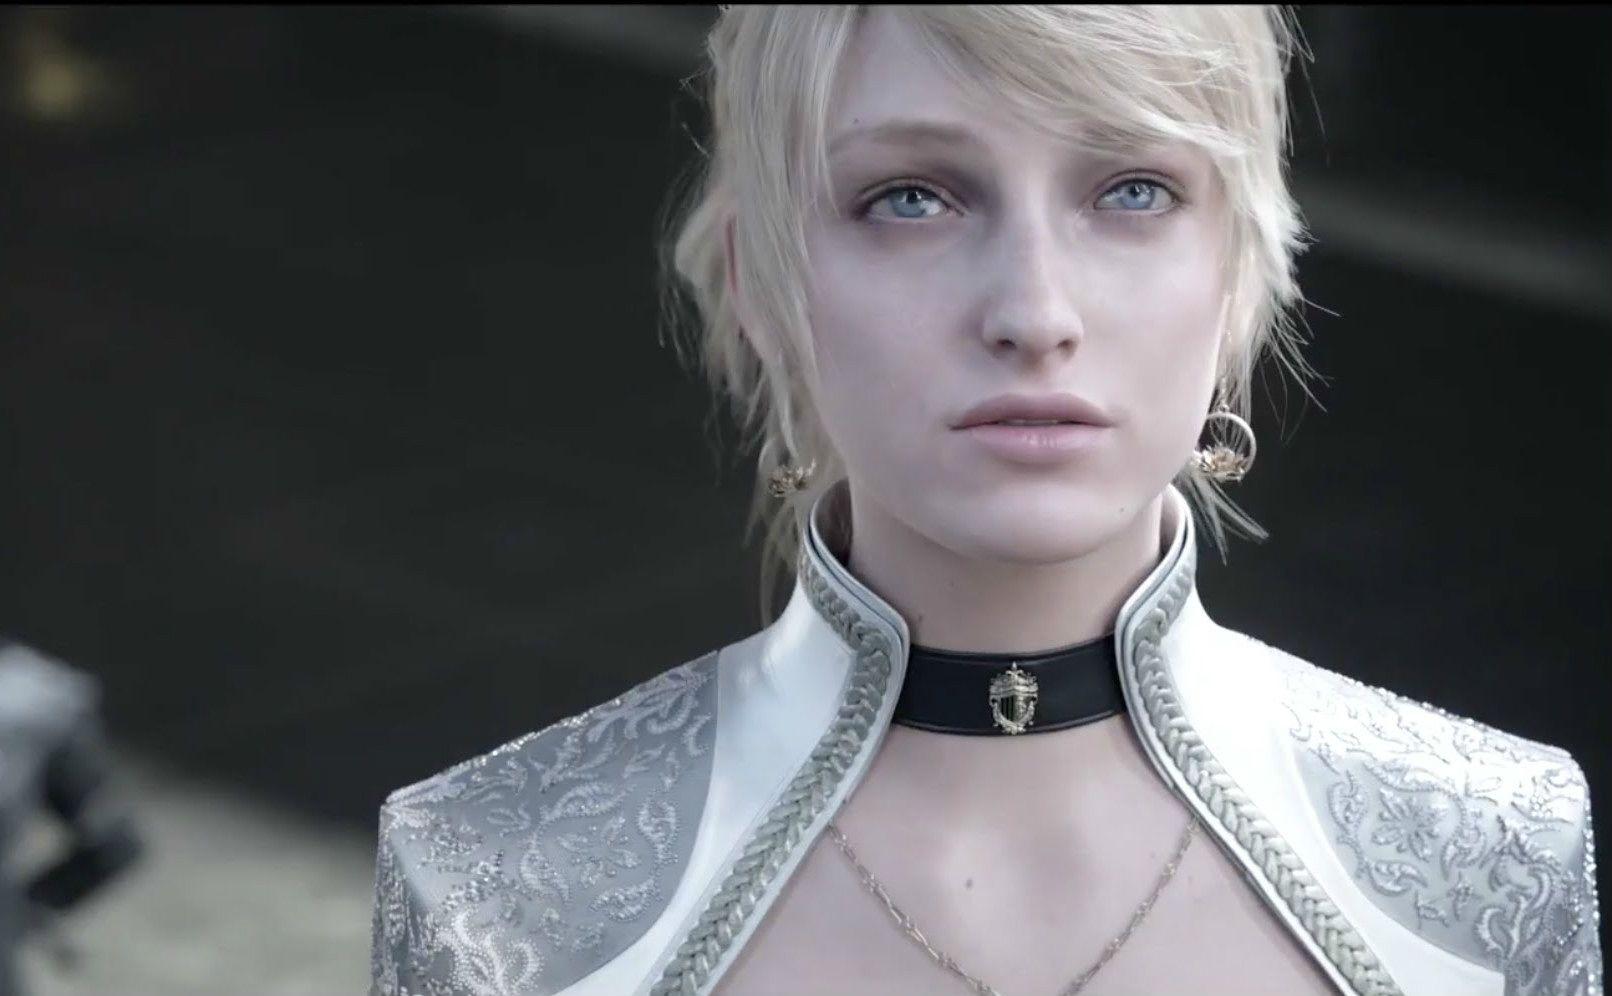 square-enix-announces-cgi-final-fantasy-movie-kingsglaive-starring-game-of-thrones-ca-913252.jpg